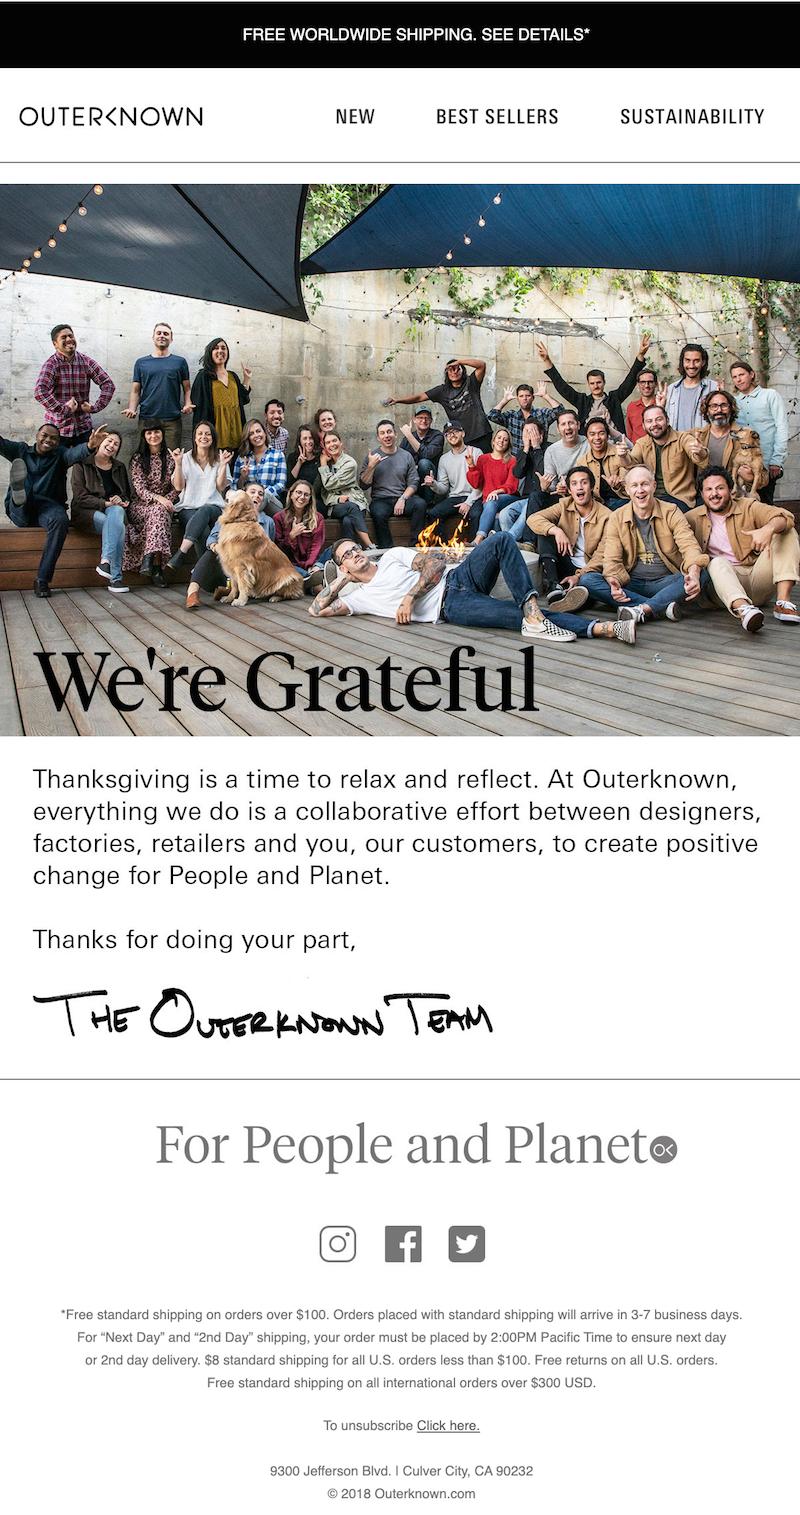 thanksgiving email marketing idea